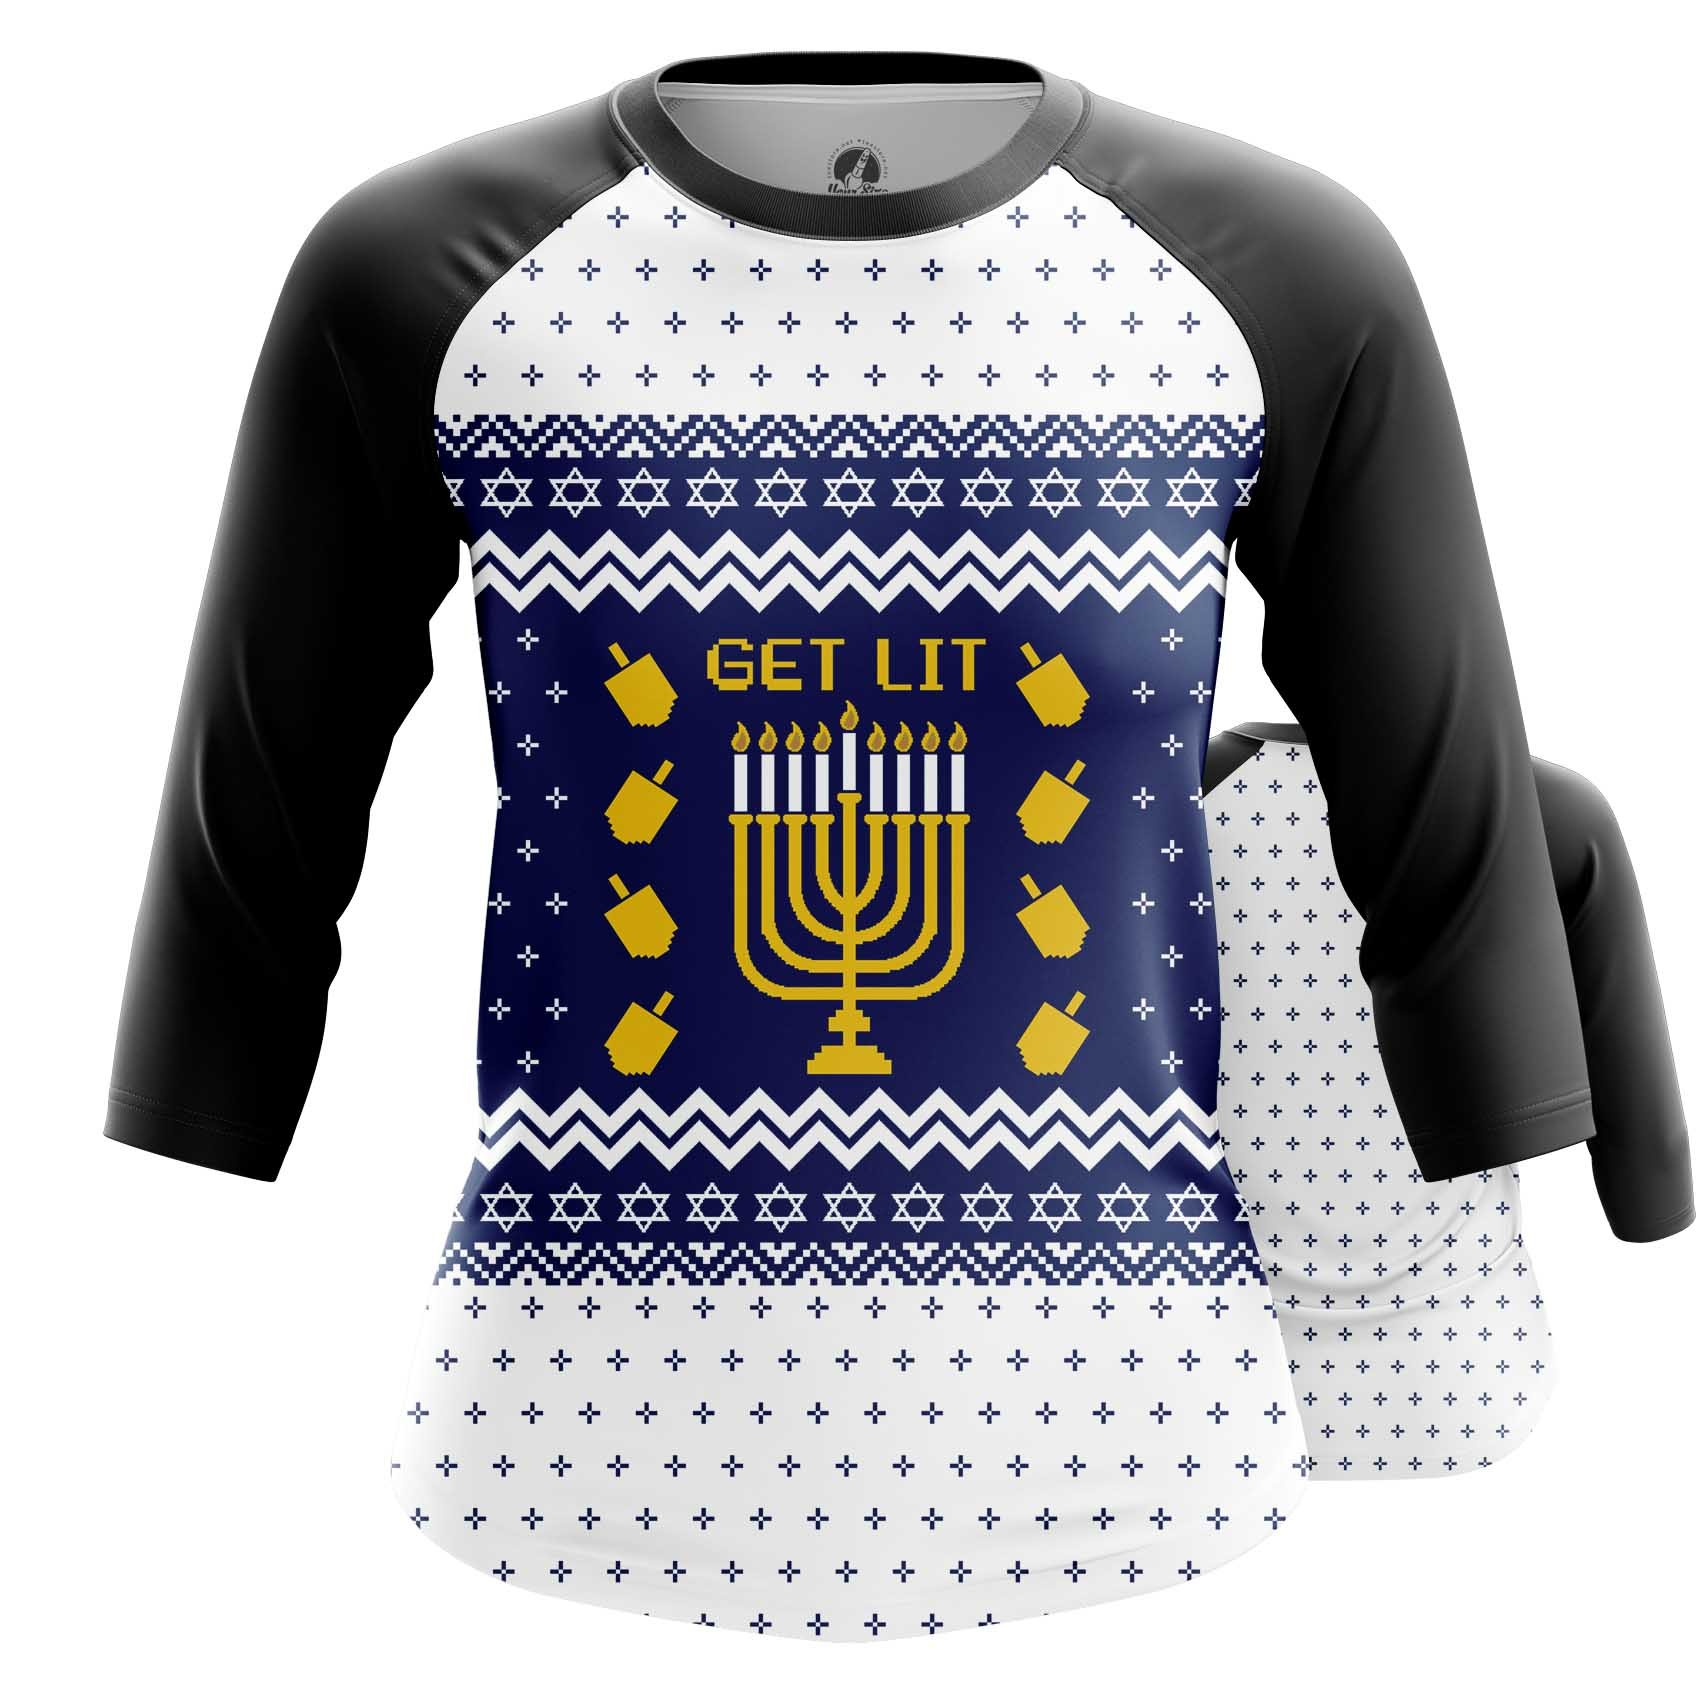 Collectibles Women'S Raglan Hanukkah Jewish Festival Christmas